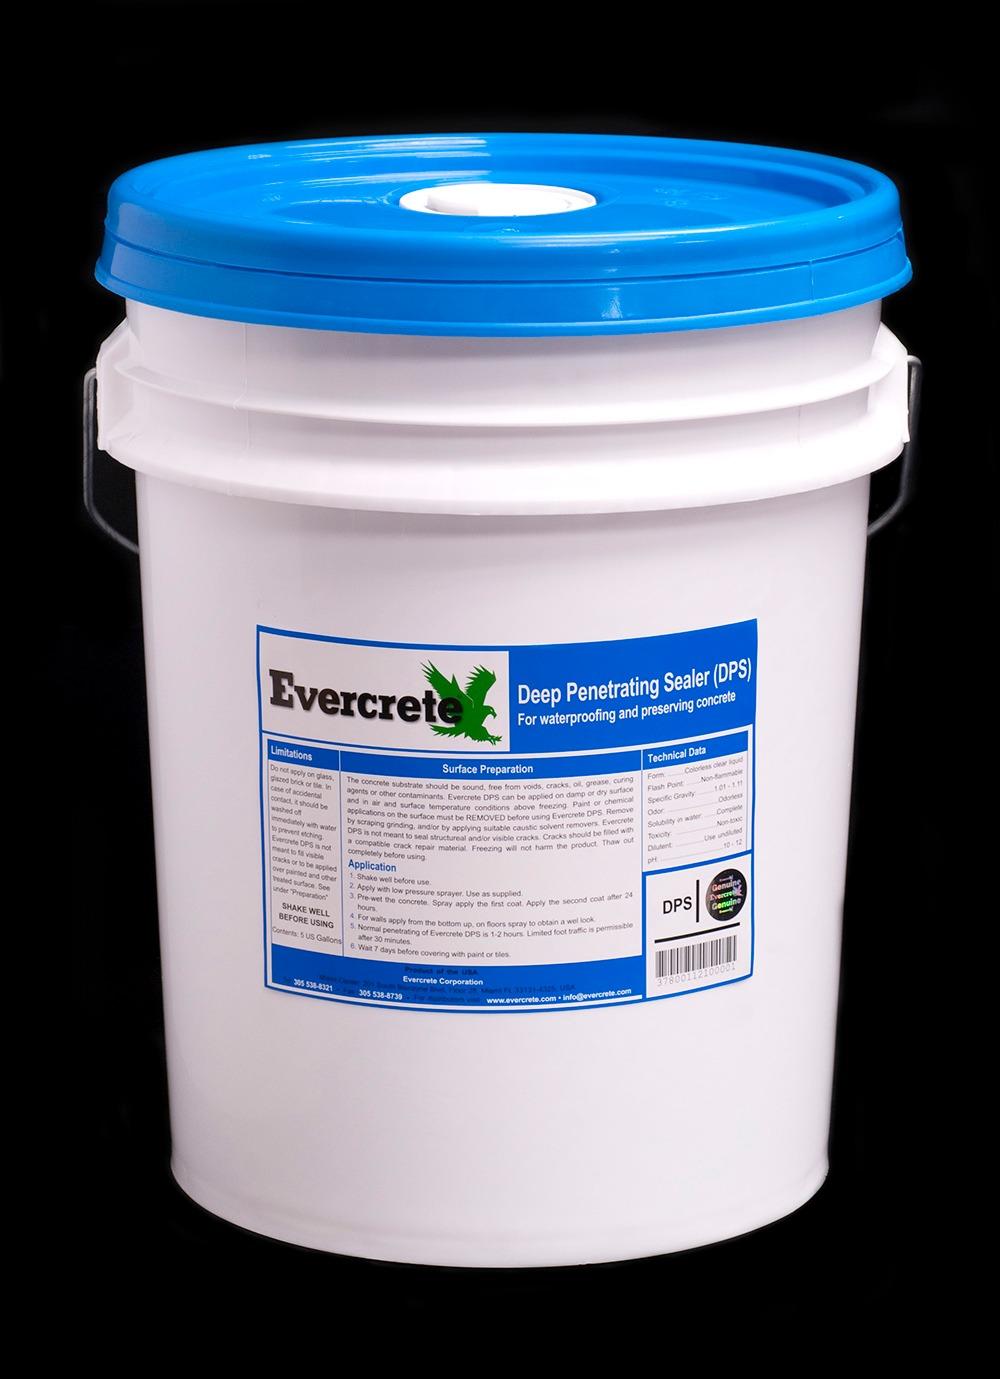 Evercrete Deep Penetrating Sealer (DPS)